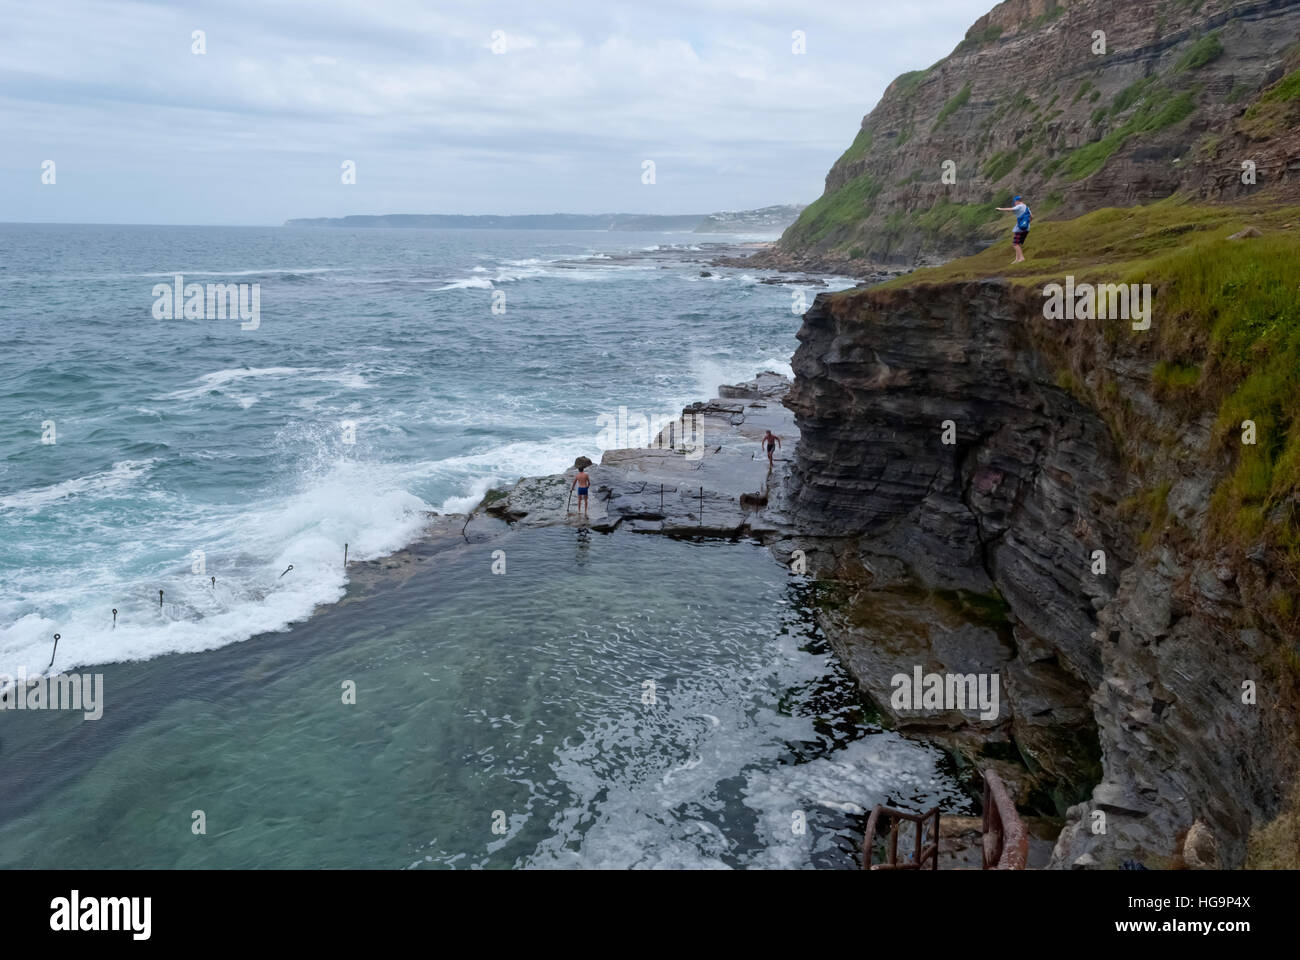 Newcastle cliffs and coast, Australia - Stock Image